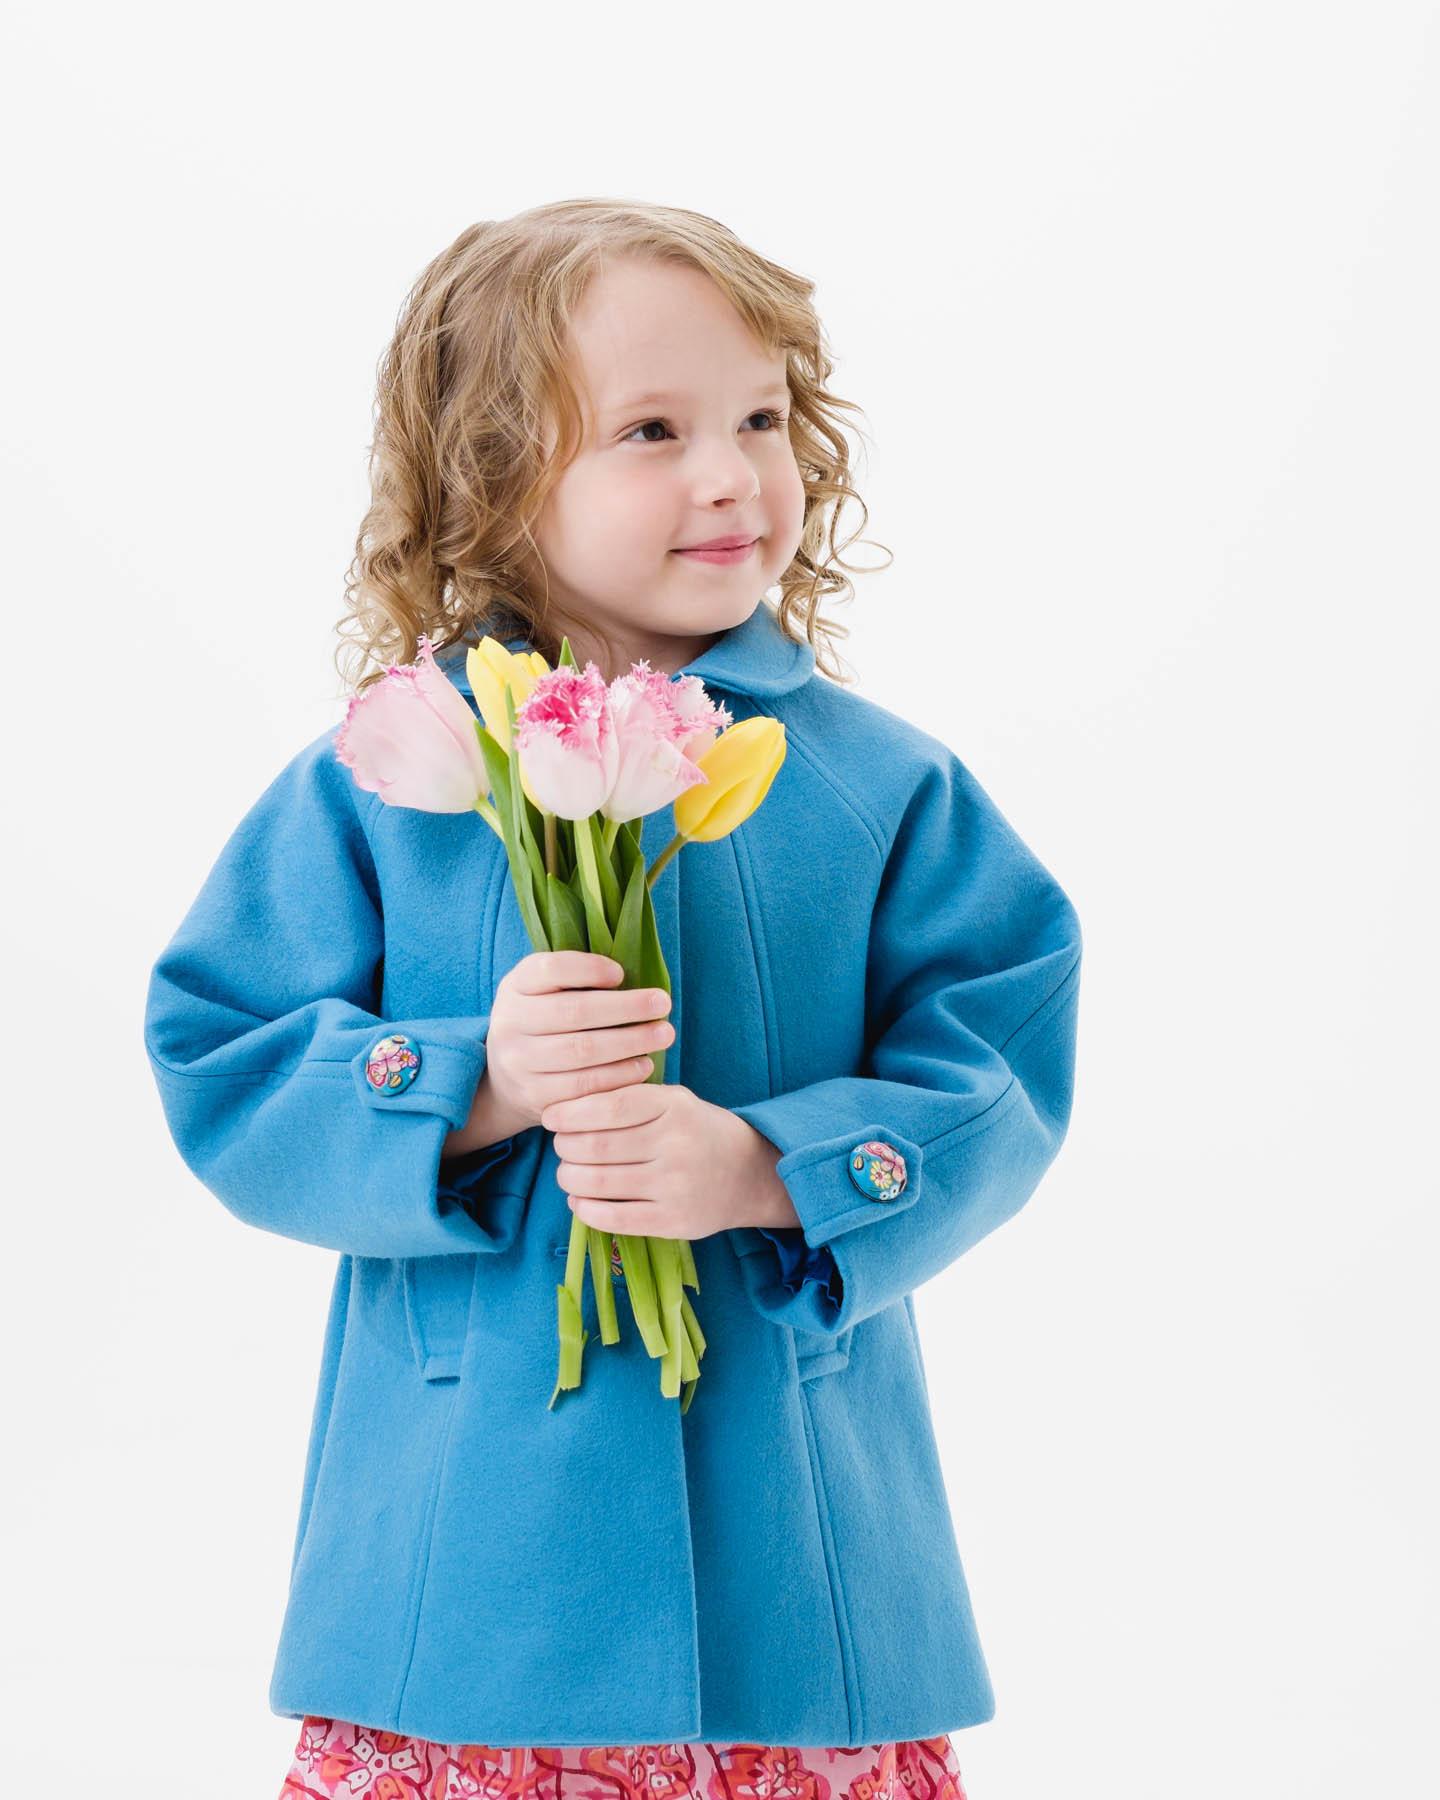 Littlegoodall-Spring2015-005.jpg